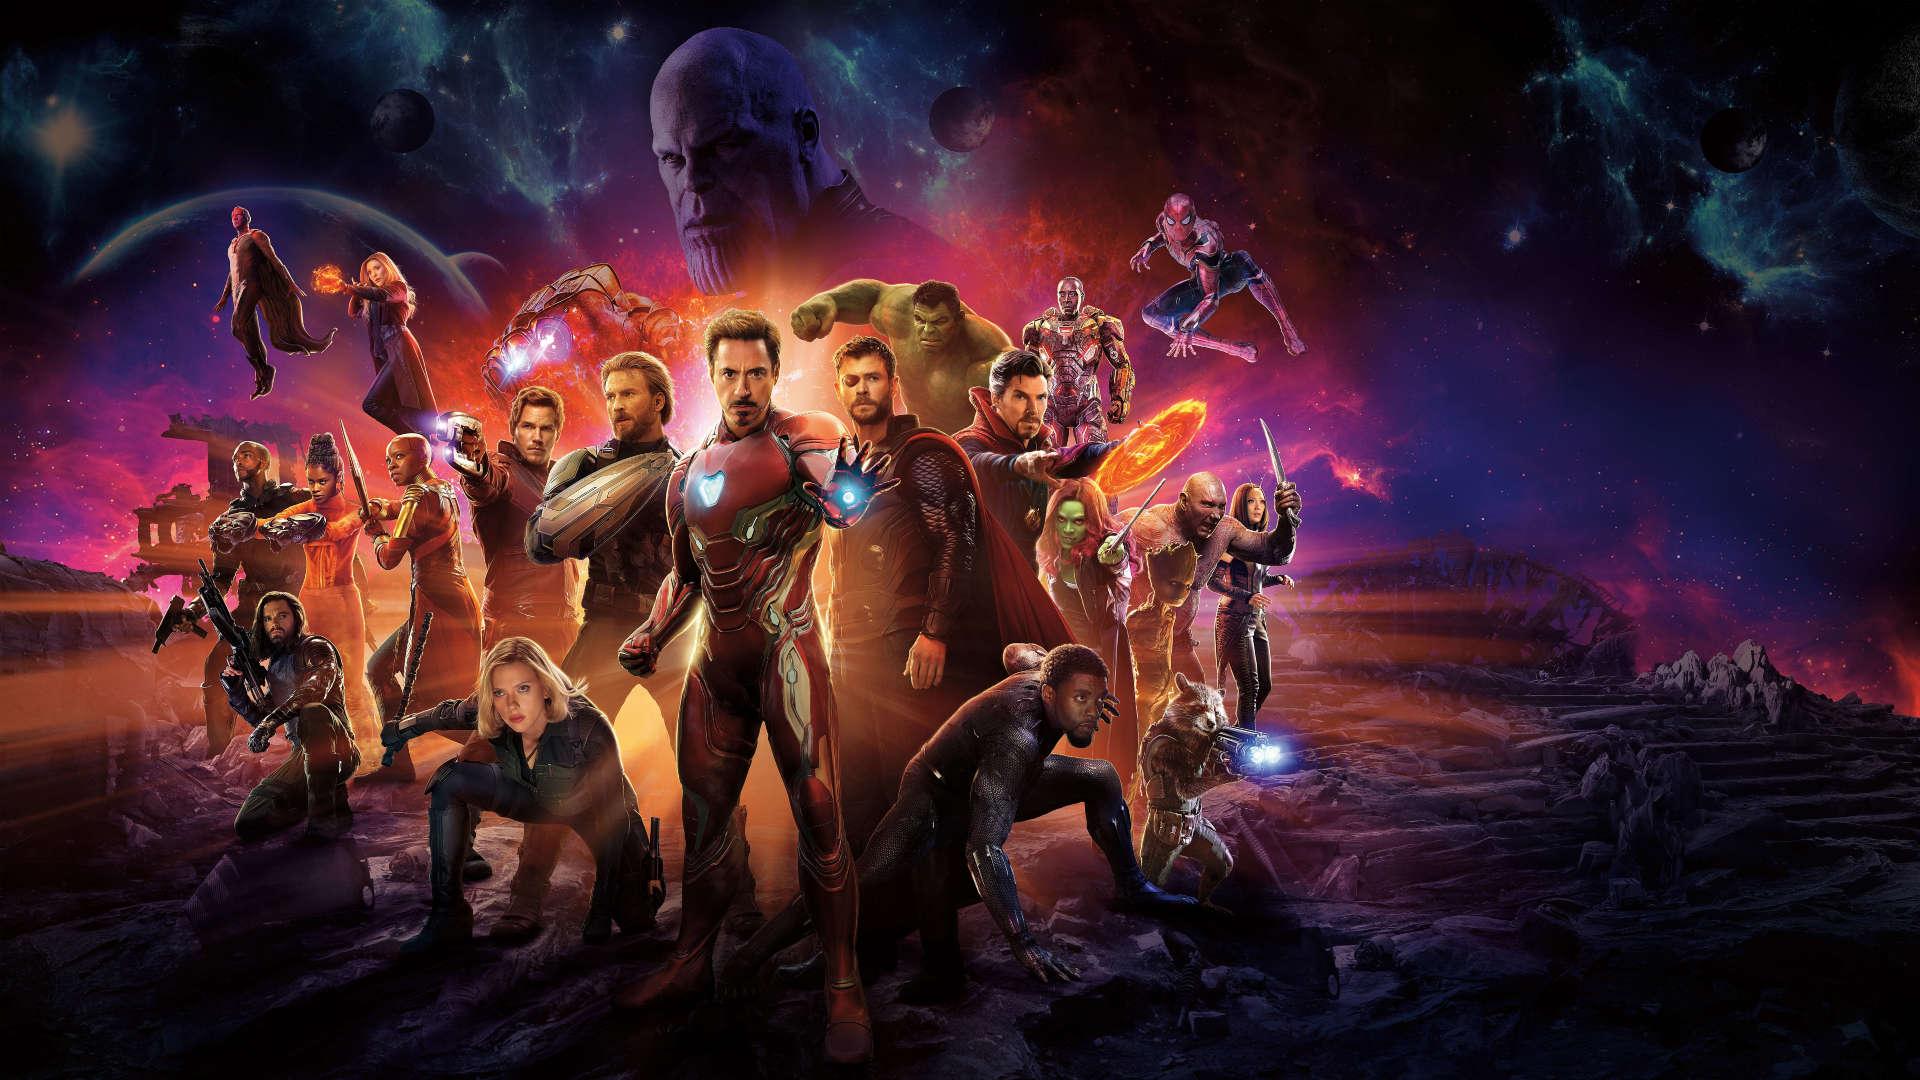 Avengers Infinity War International Poster Avengers